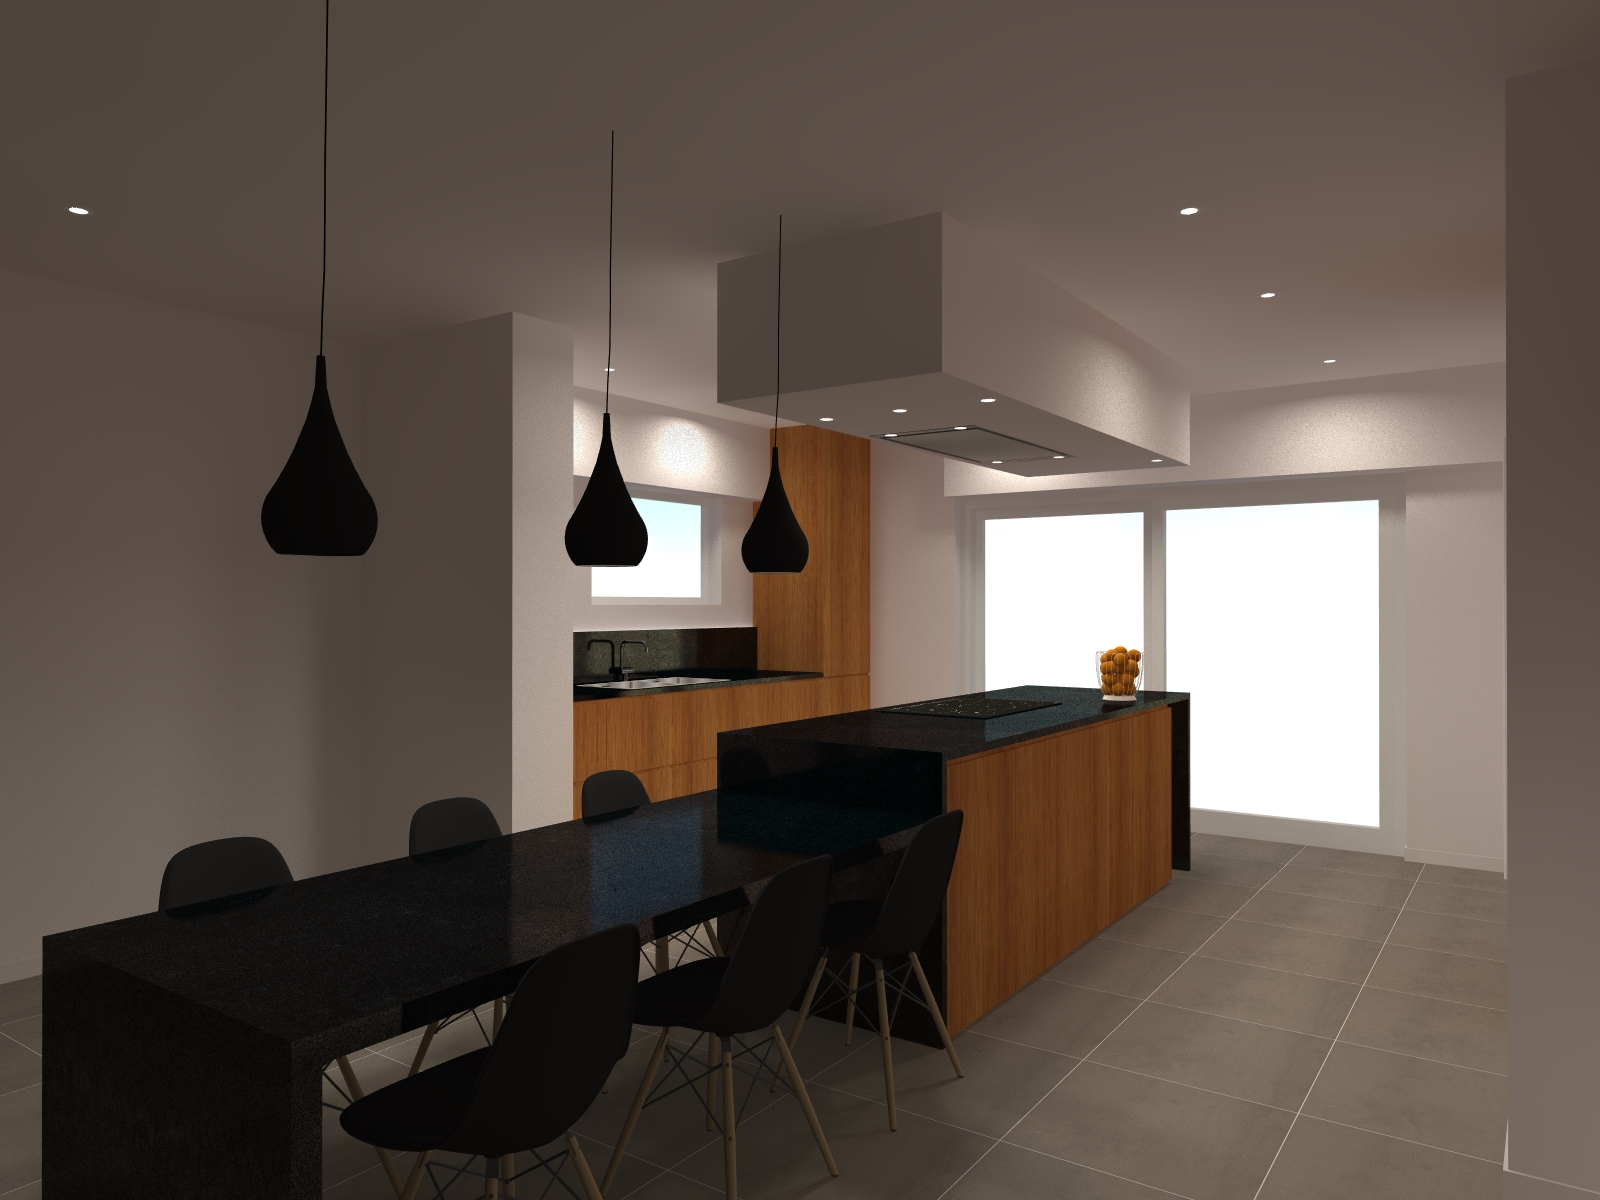 keuken1 variant